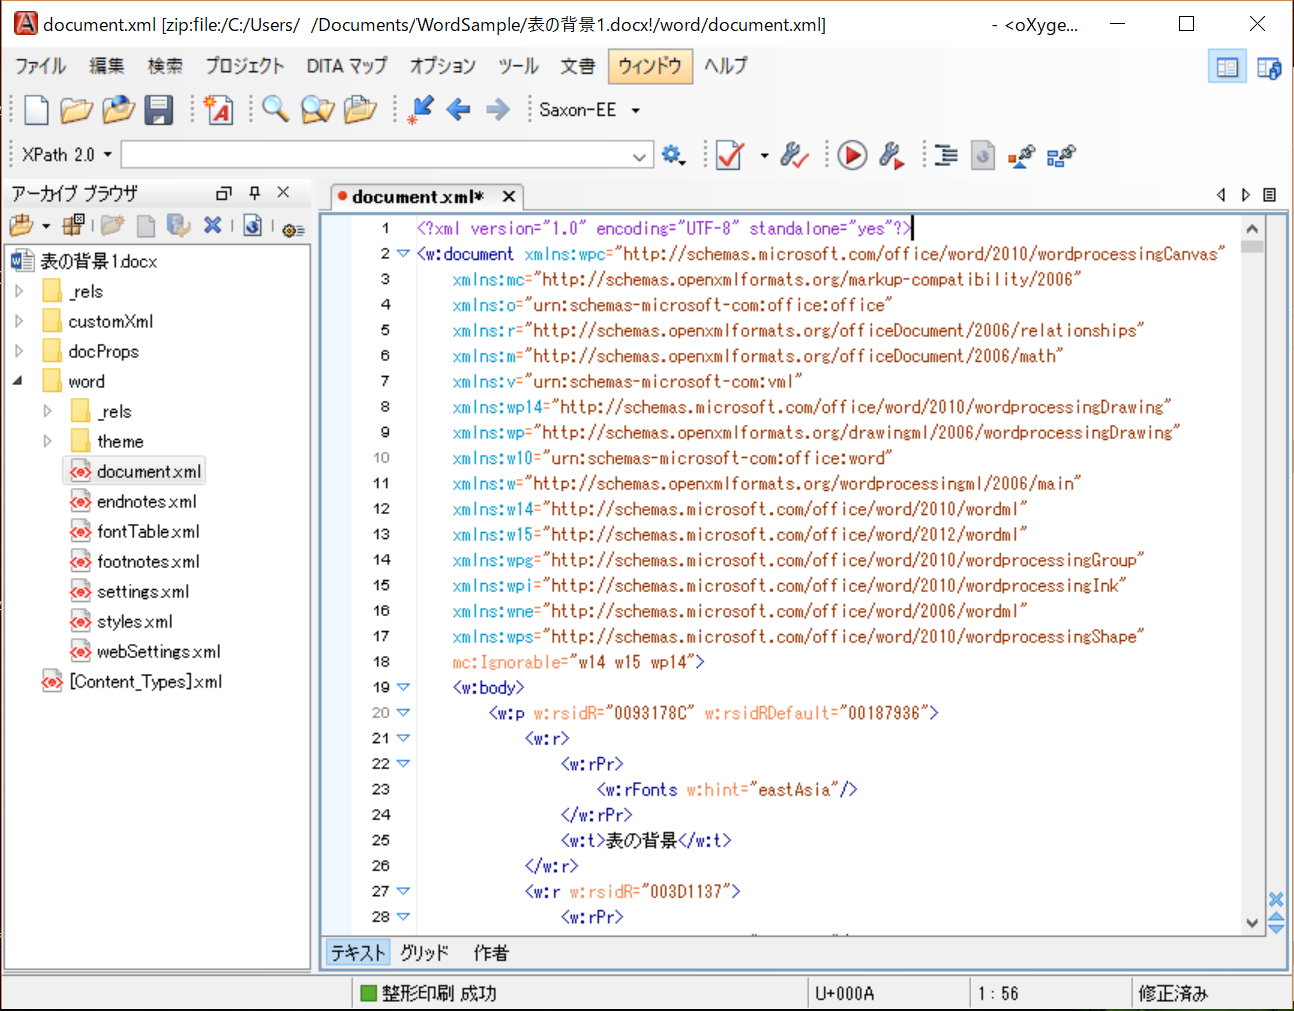 ooxml office open xml とは 概要 メリットと活用アプリケーション